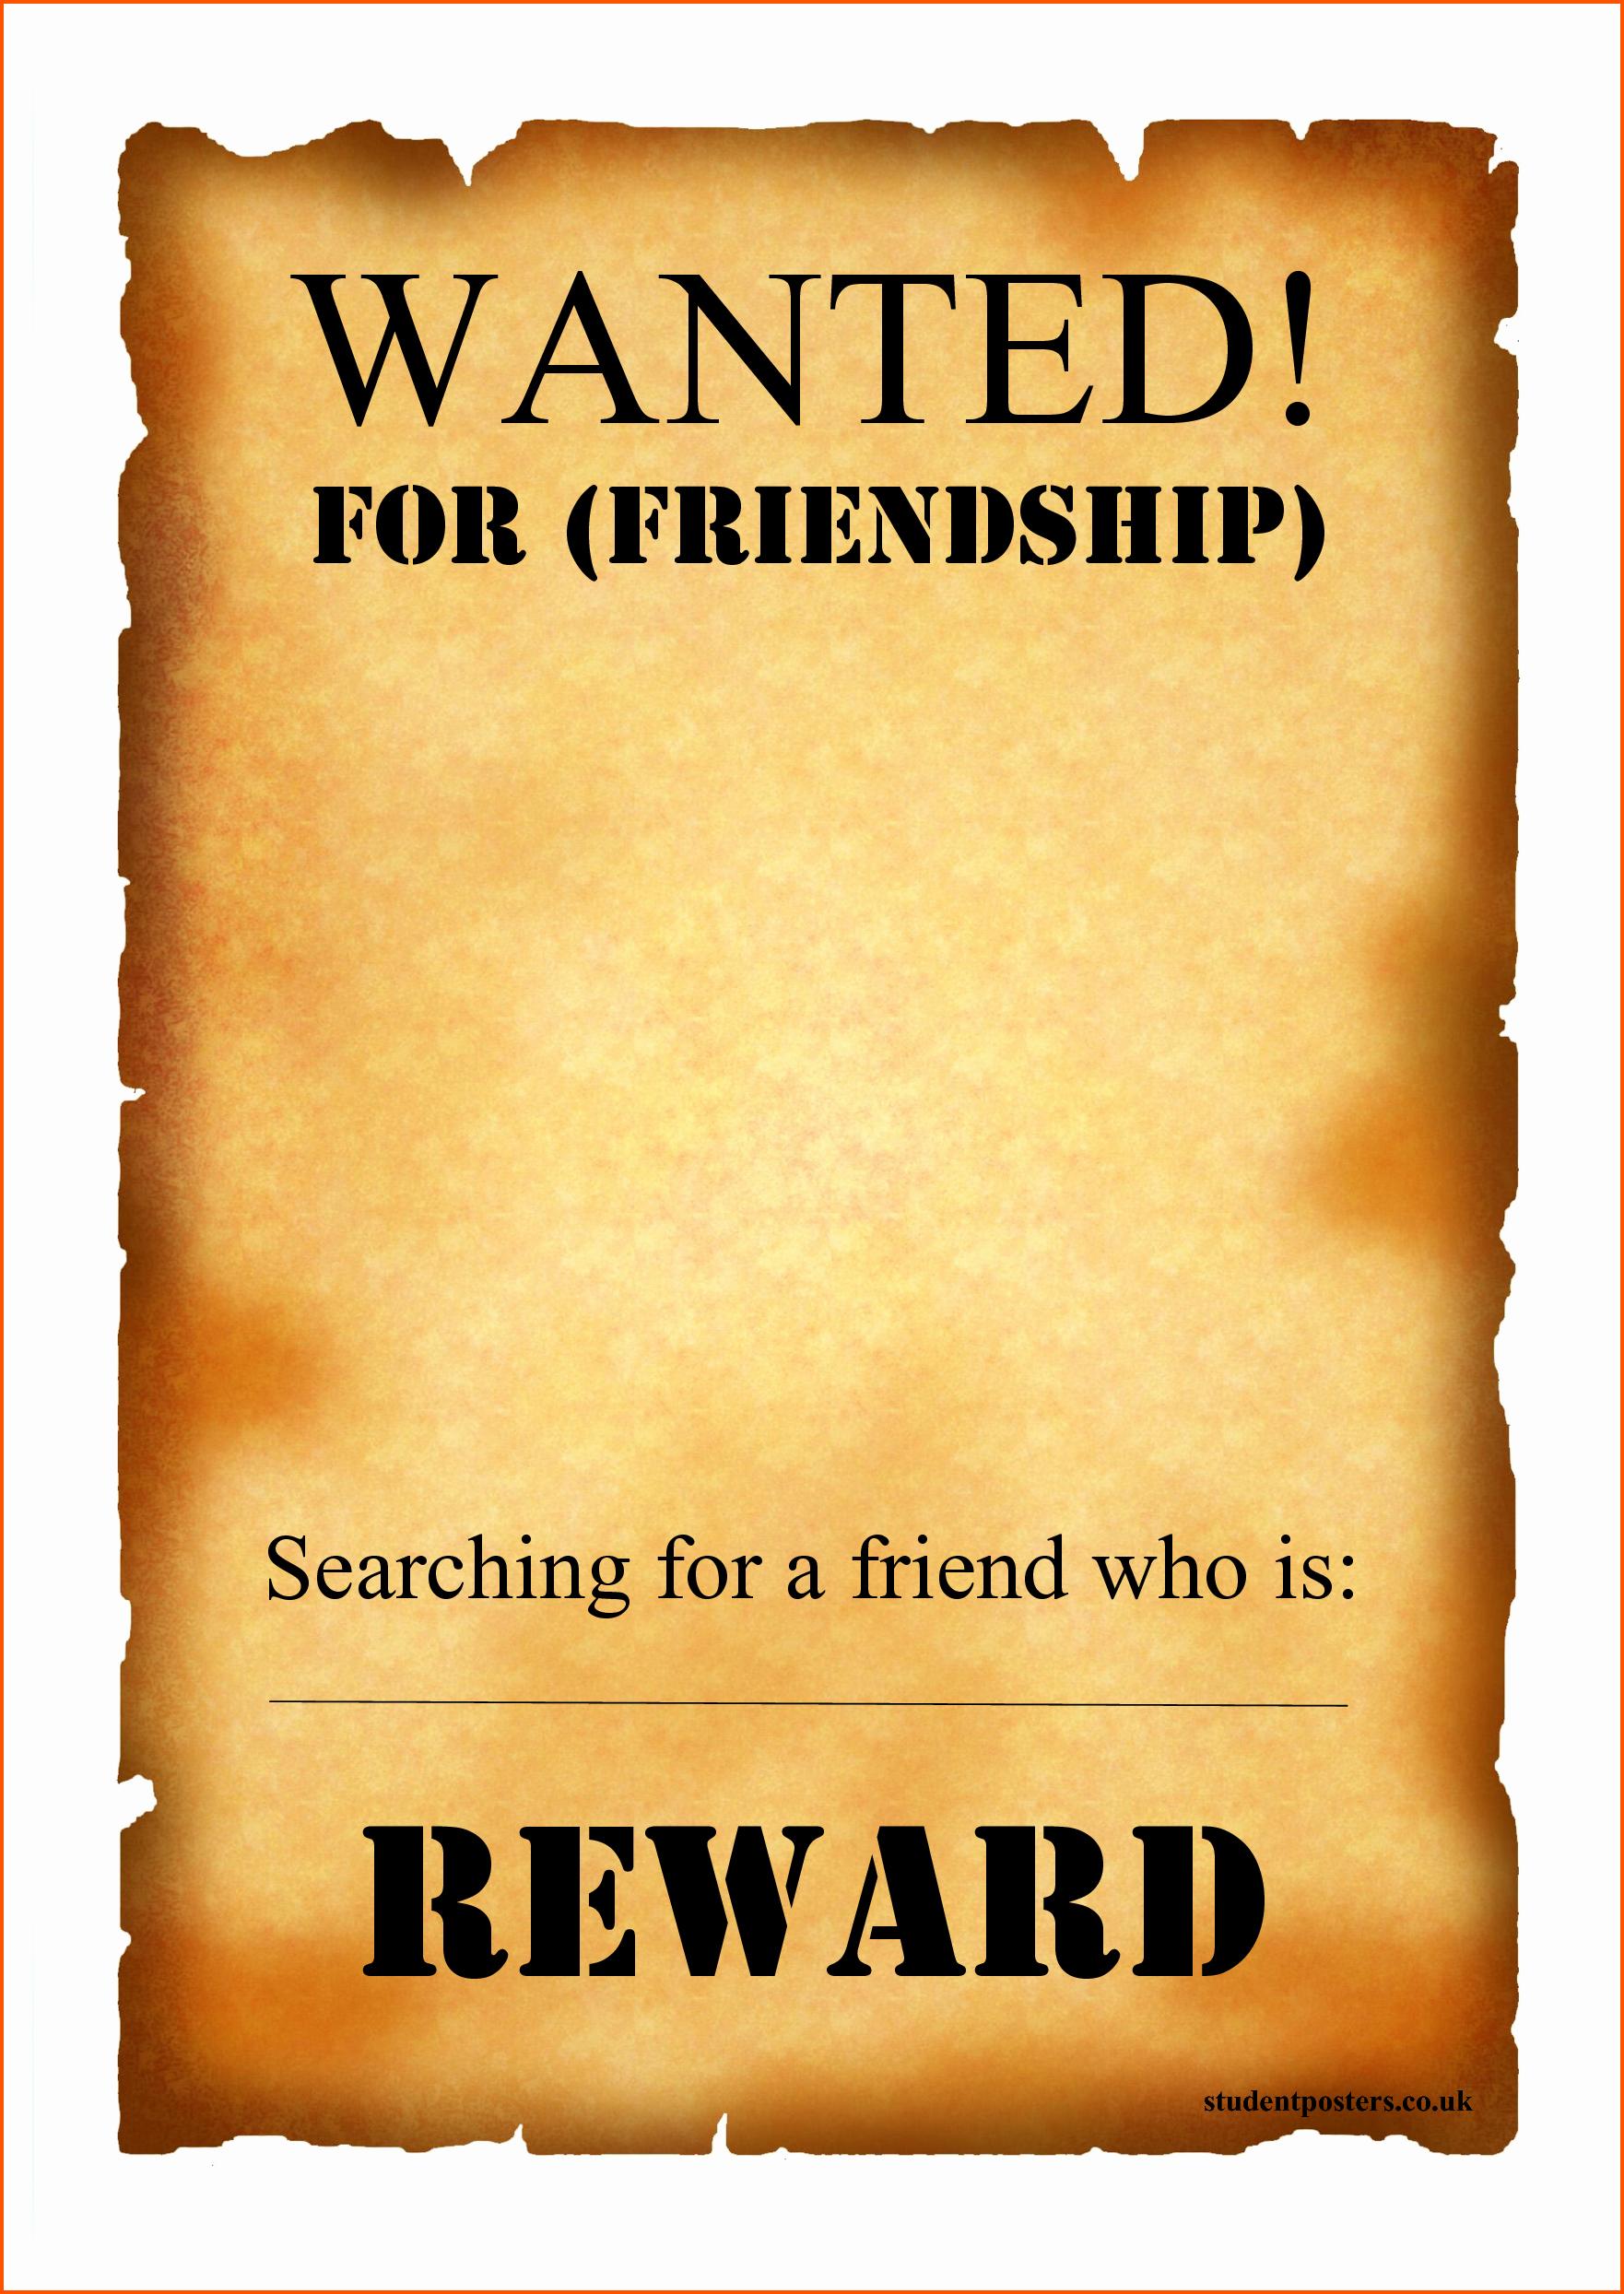 Wanted Poster format Portablegasgrillweber